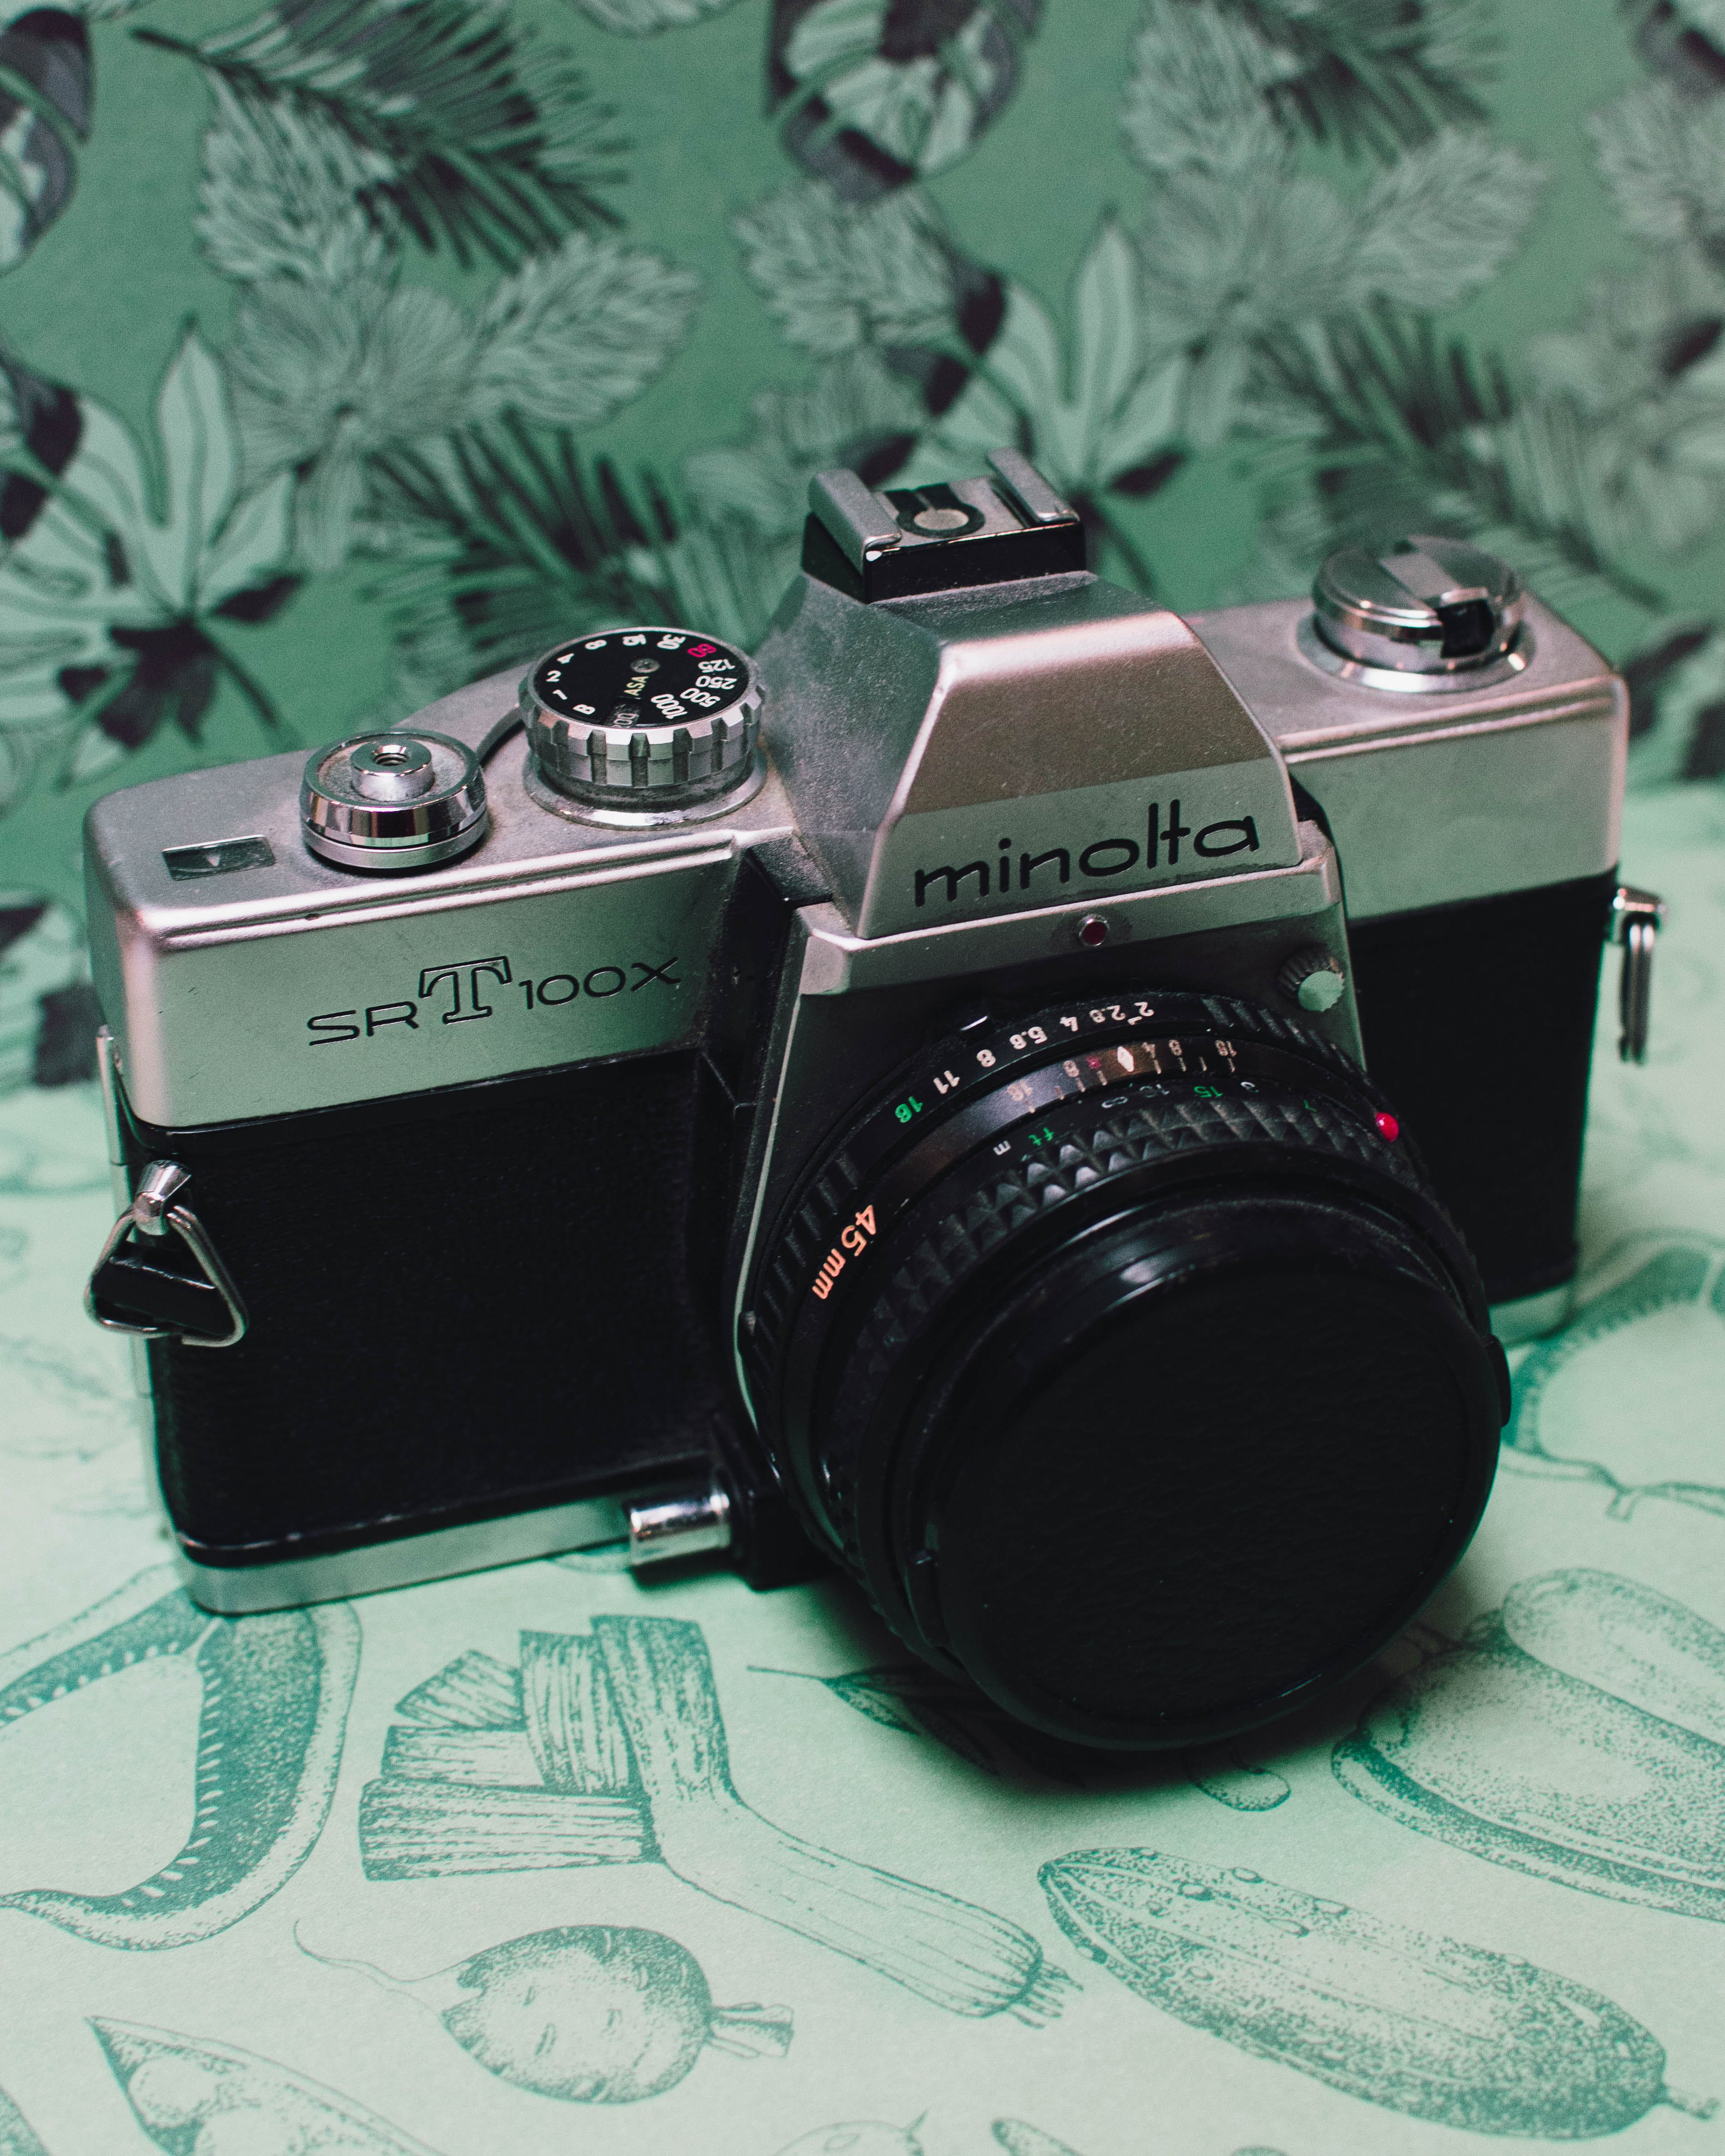 Black and Grey Minolta Dslr Camera